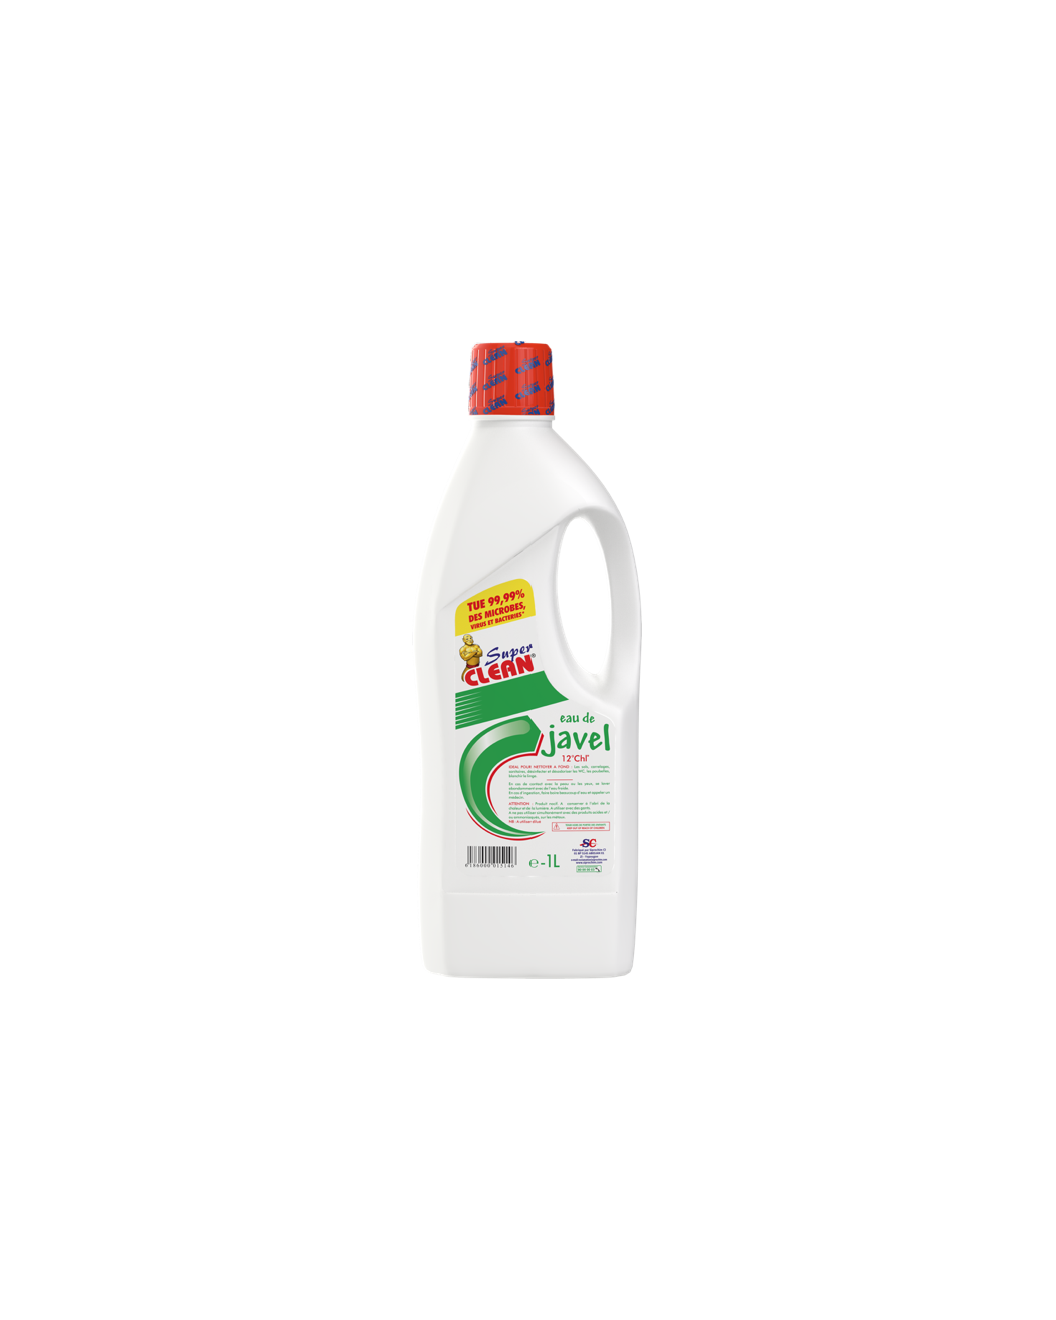 SUPER CLEAN_Eau de Javel 12° 1L